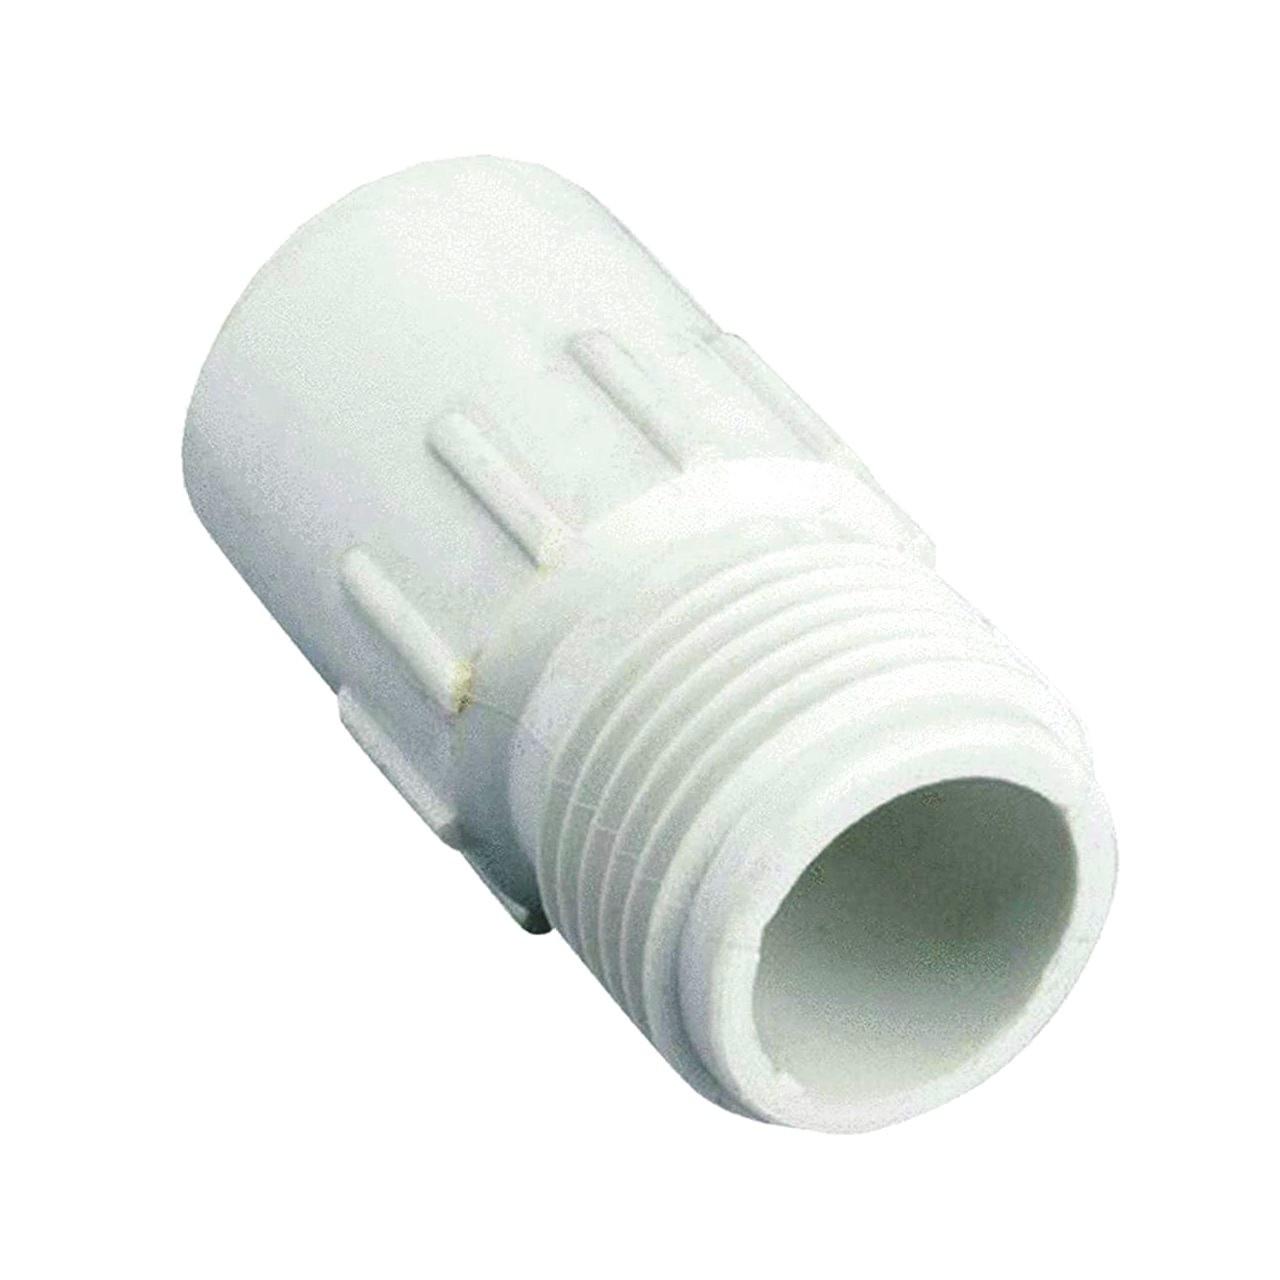 Buy the Orbit 53362 Garden Hose to PVC Pipe Fitting